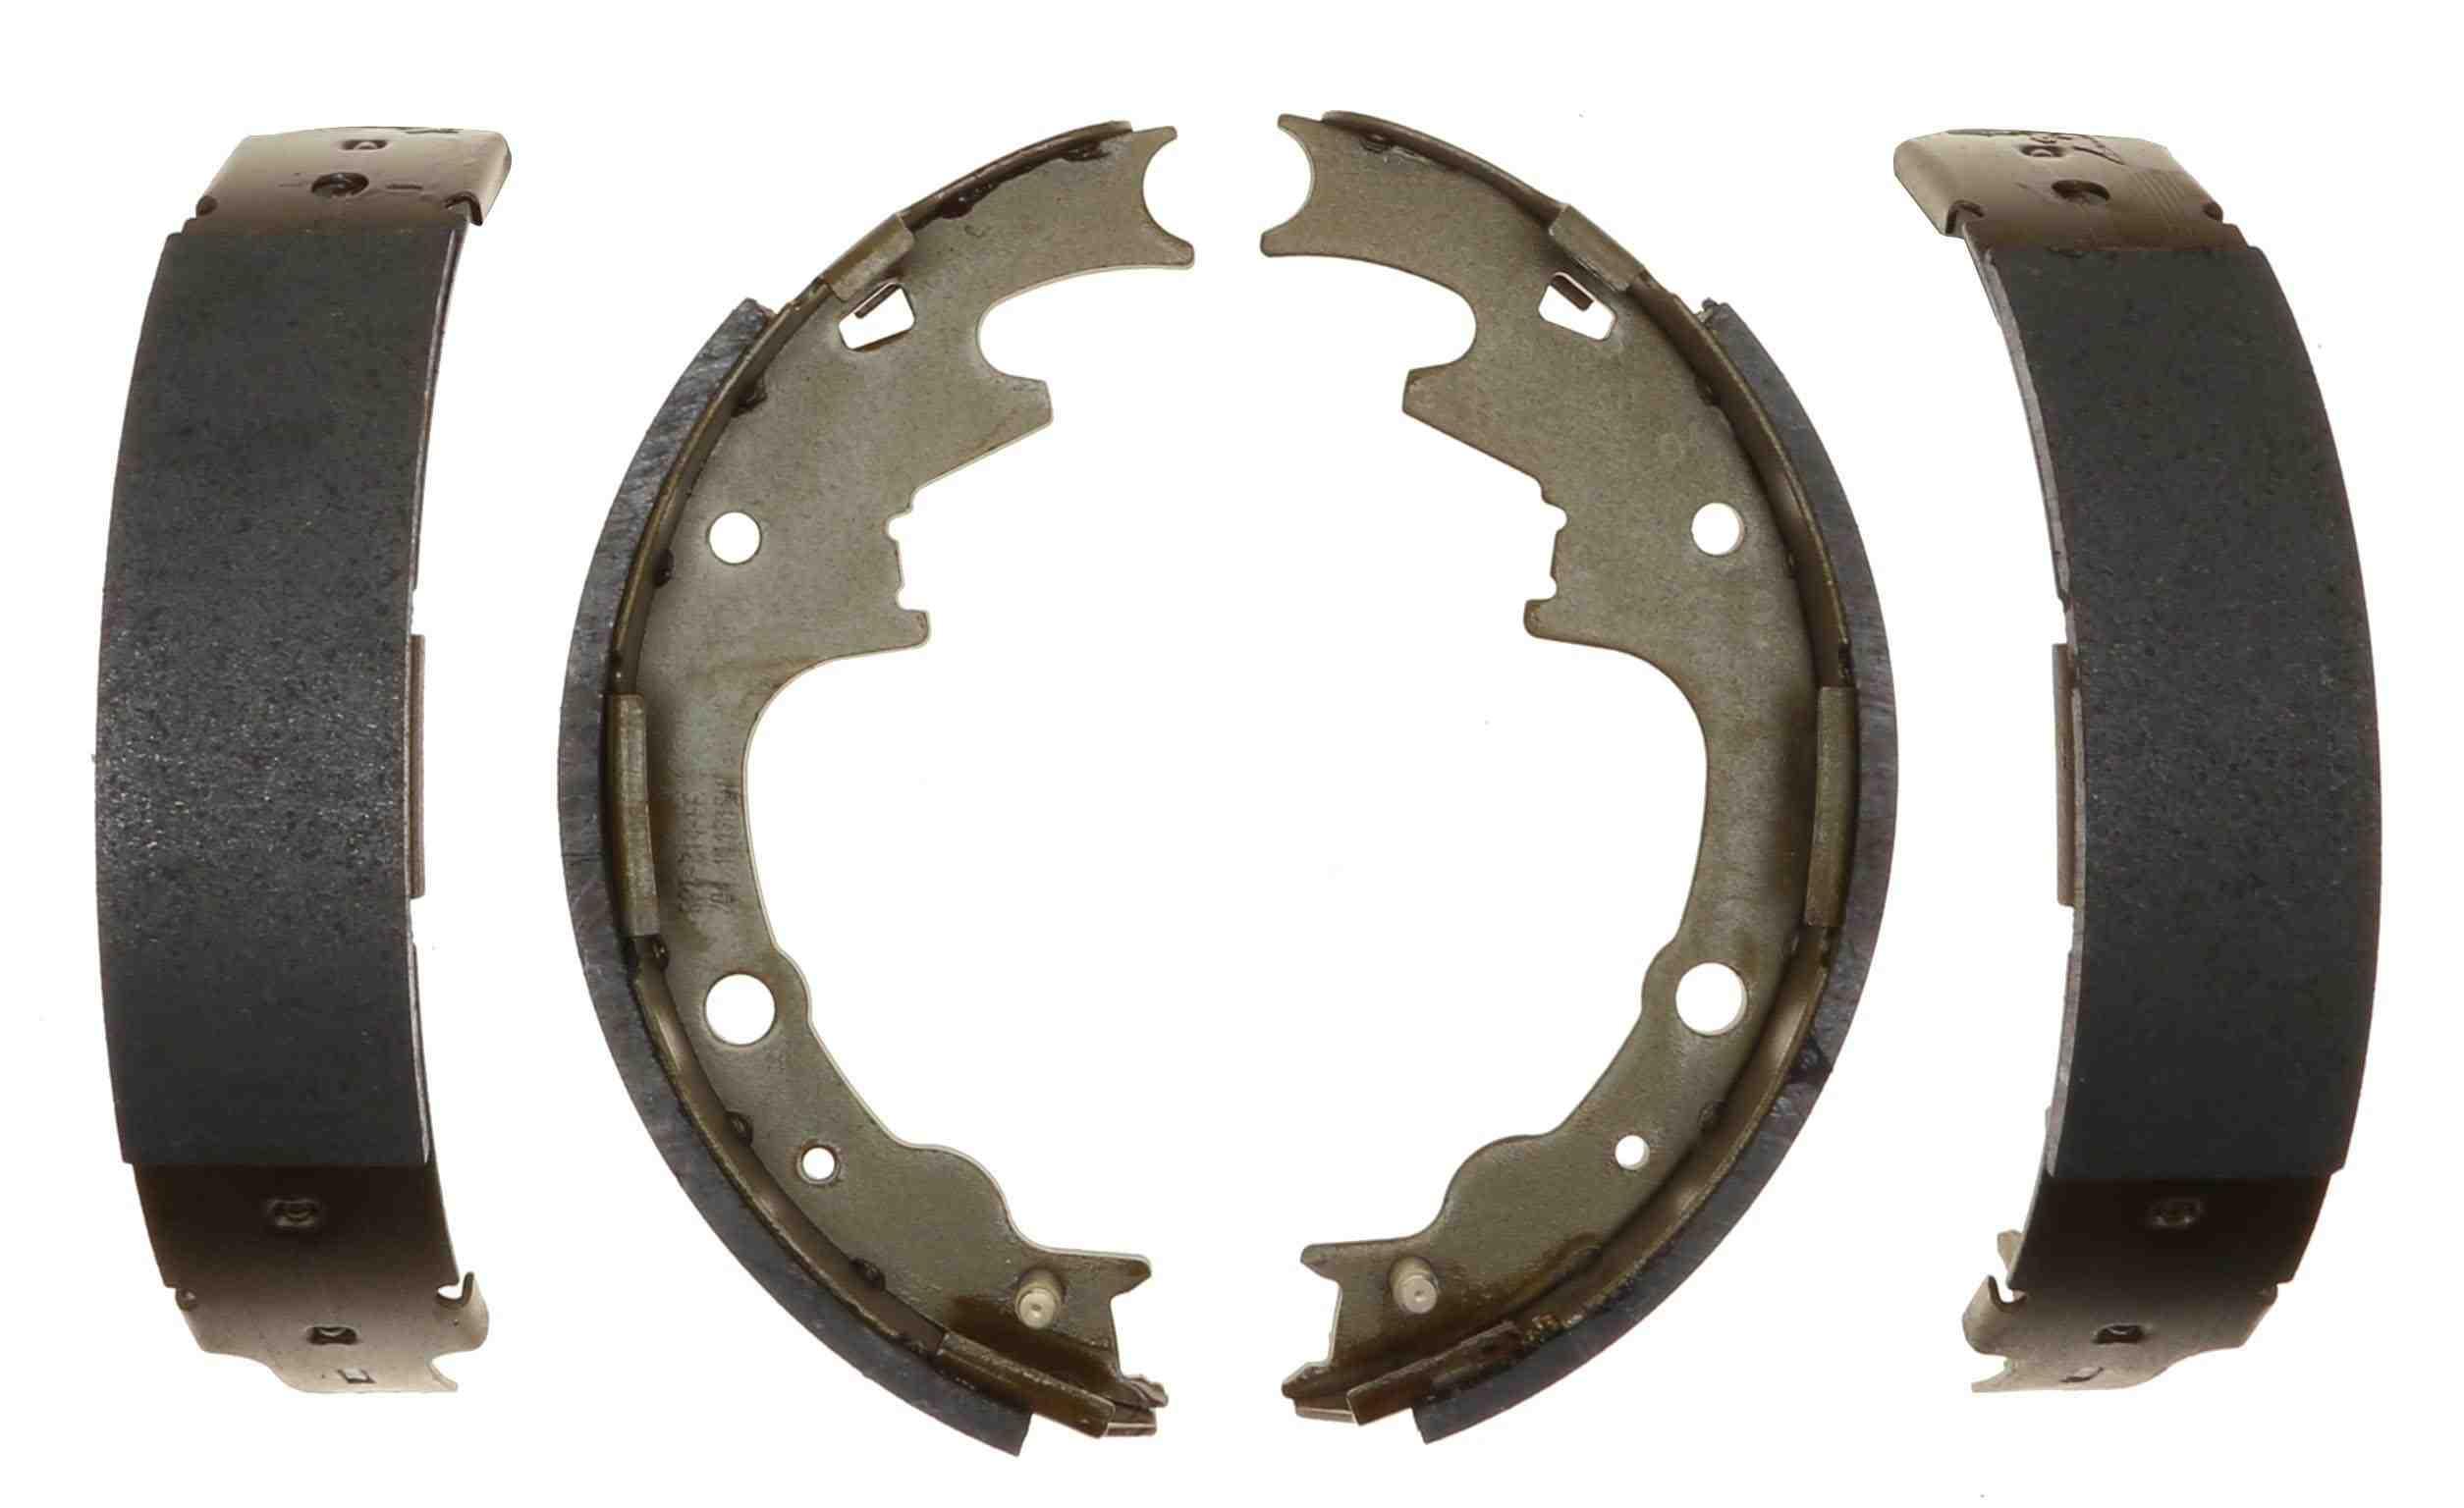 ACDELCO PROFESSIONAL BRAKES - Bonded Drum Brake Shoe (Rear) - ADU 17704B